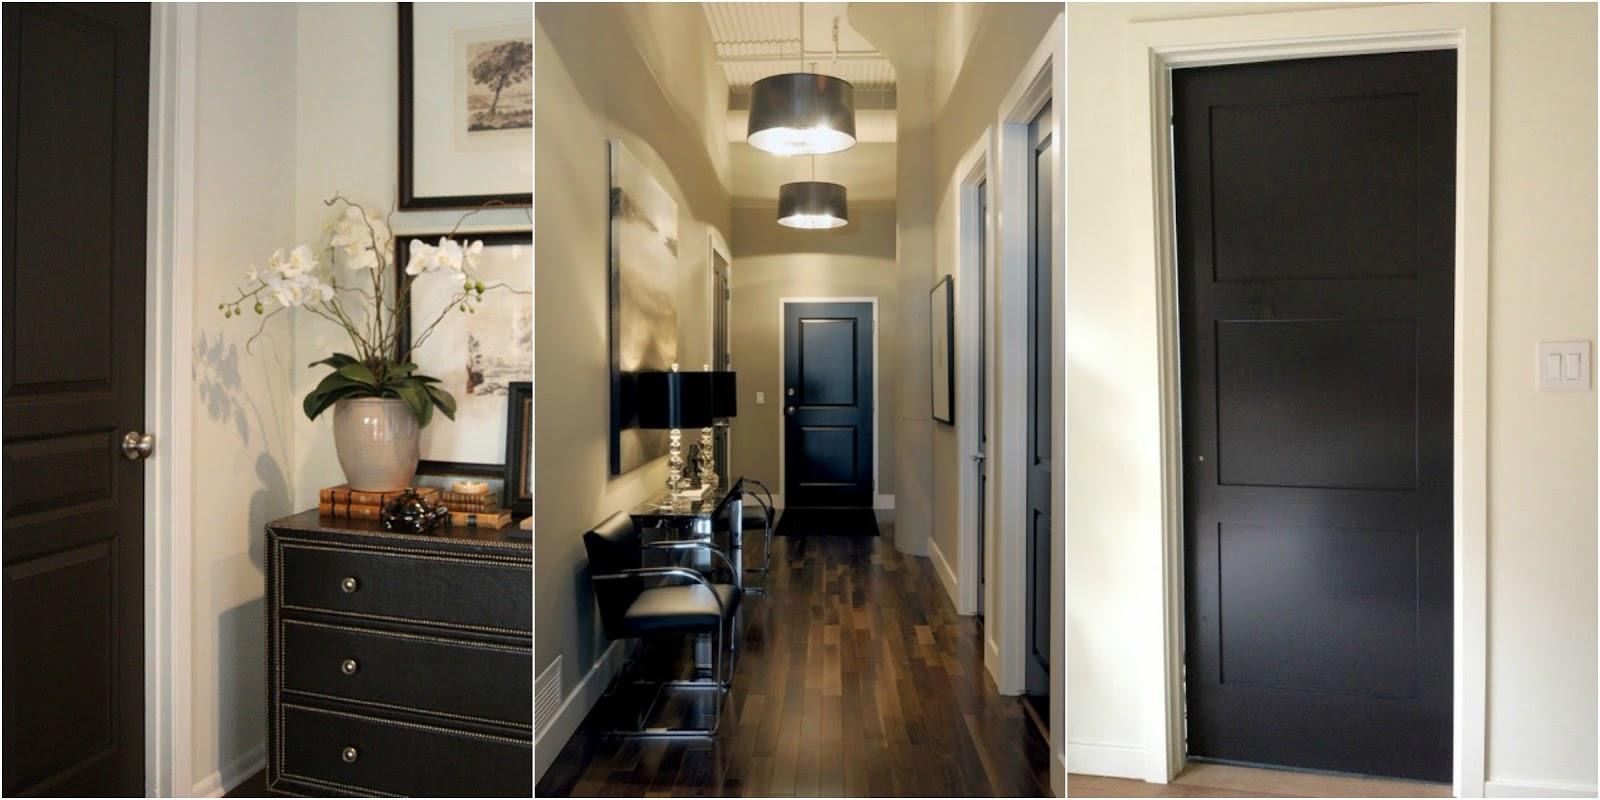 Design megillah updating doors updating doors planetlyrics Image collections